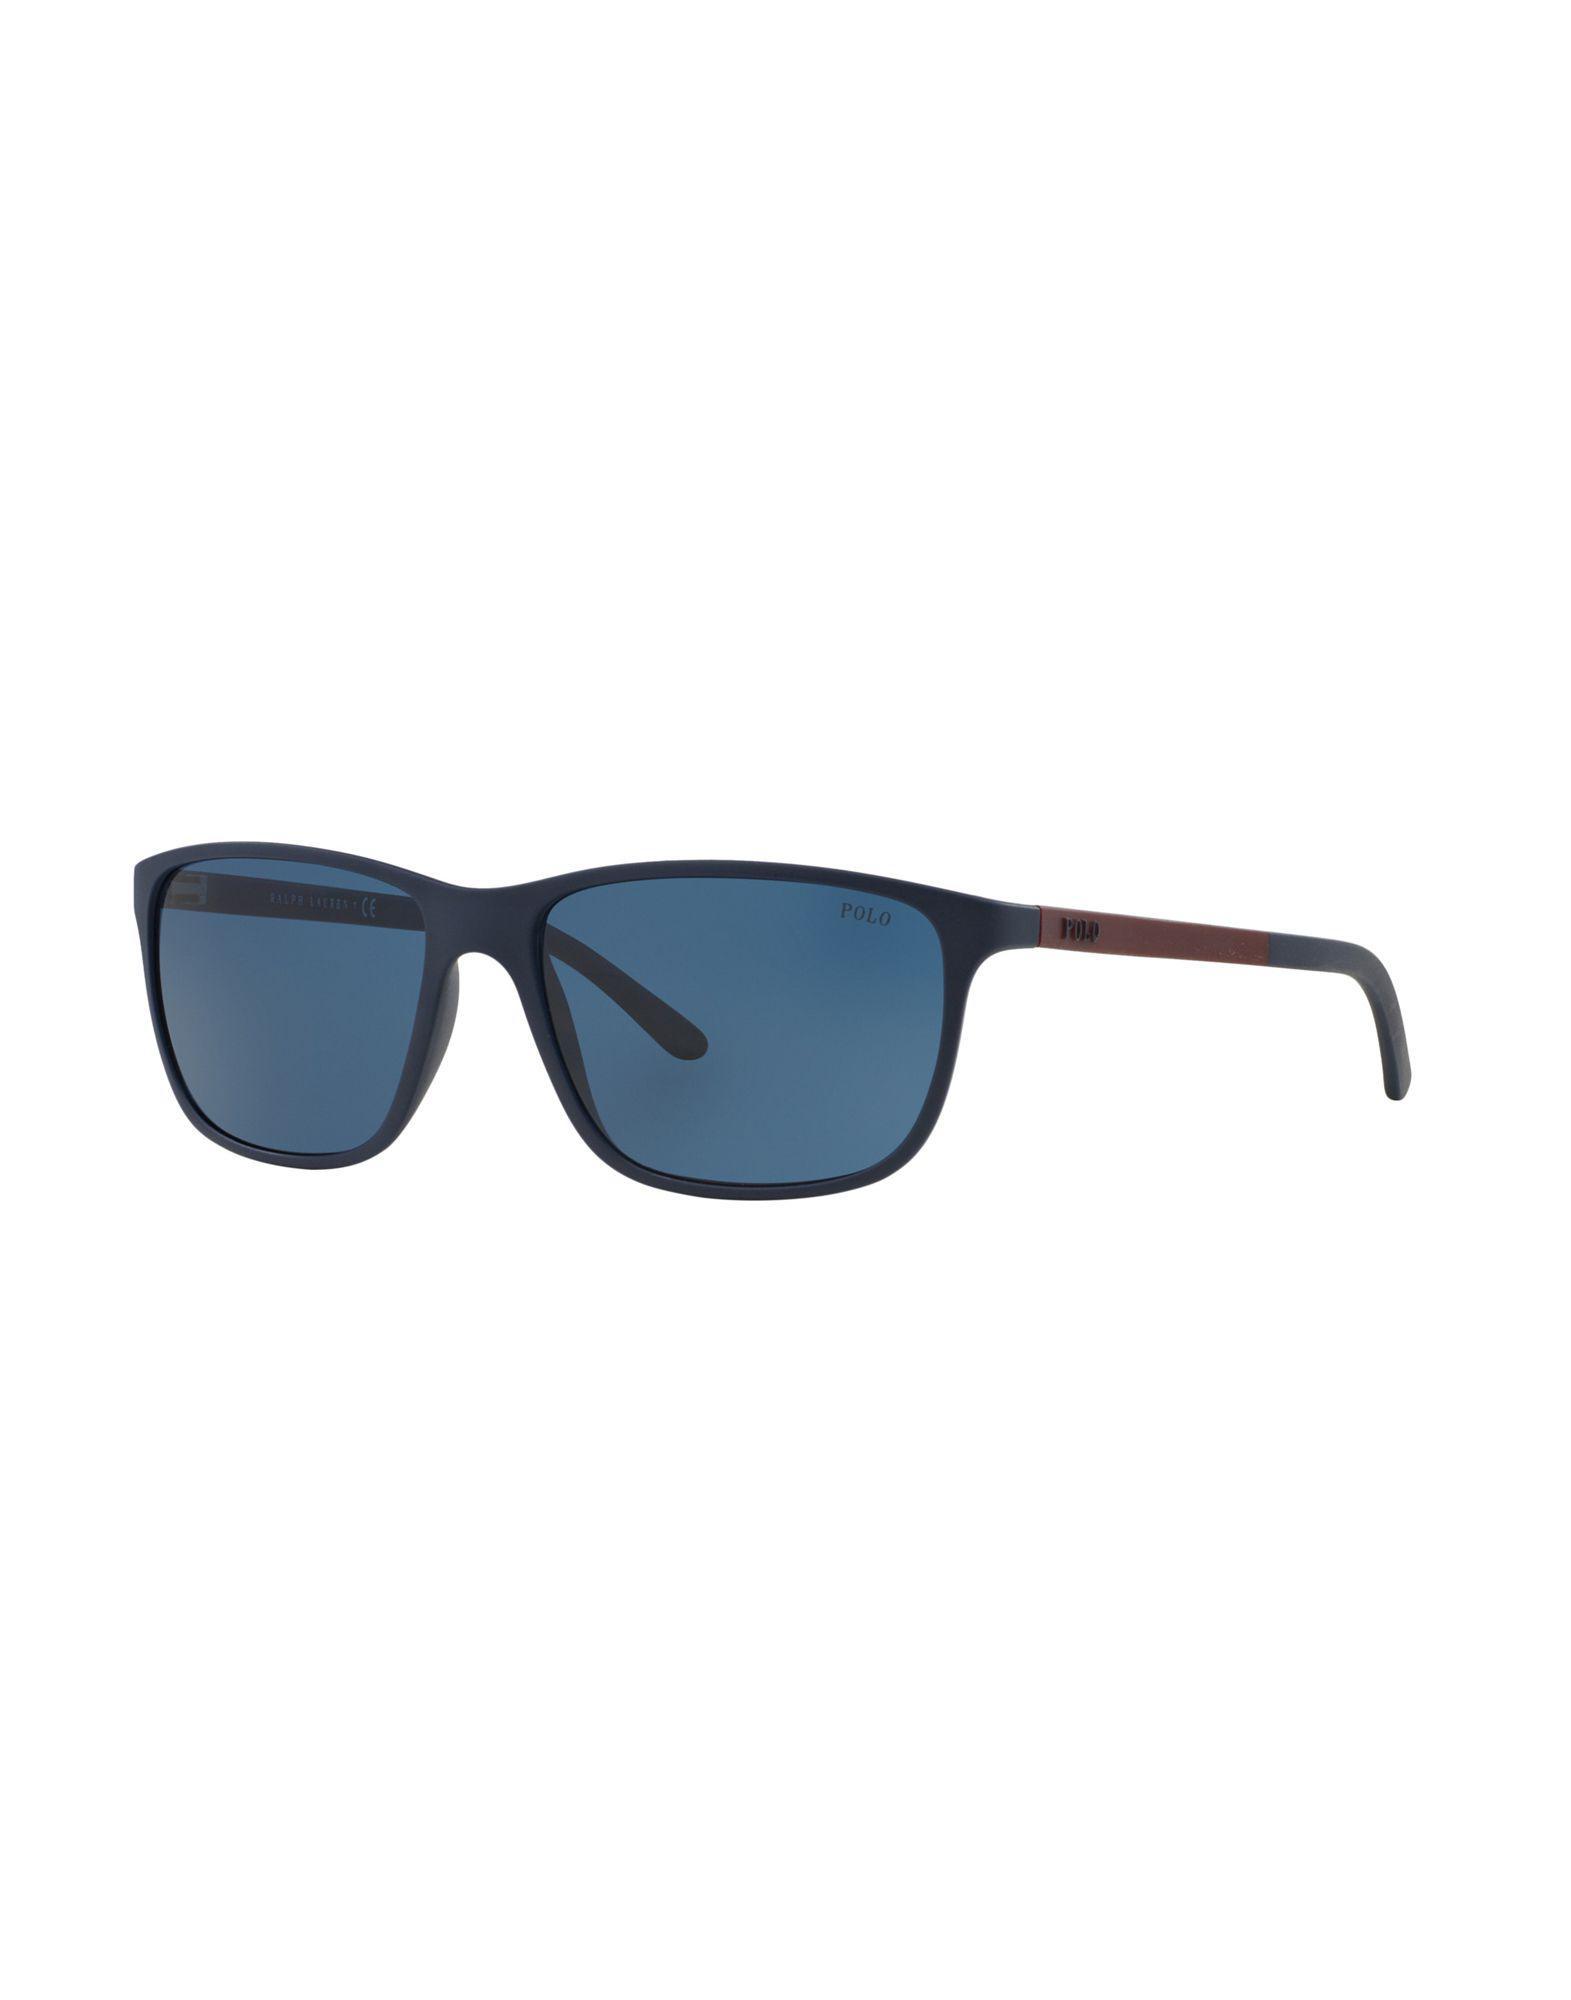 0656cc8c3f Polo Ralph Lauren Sunglasses in Blue for Men - Lyst